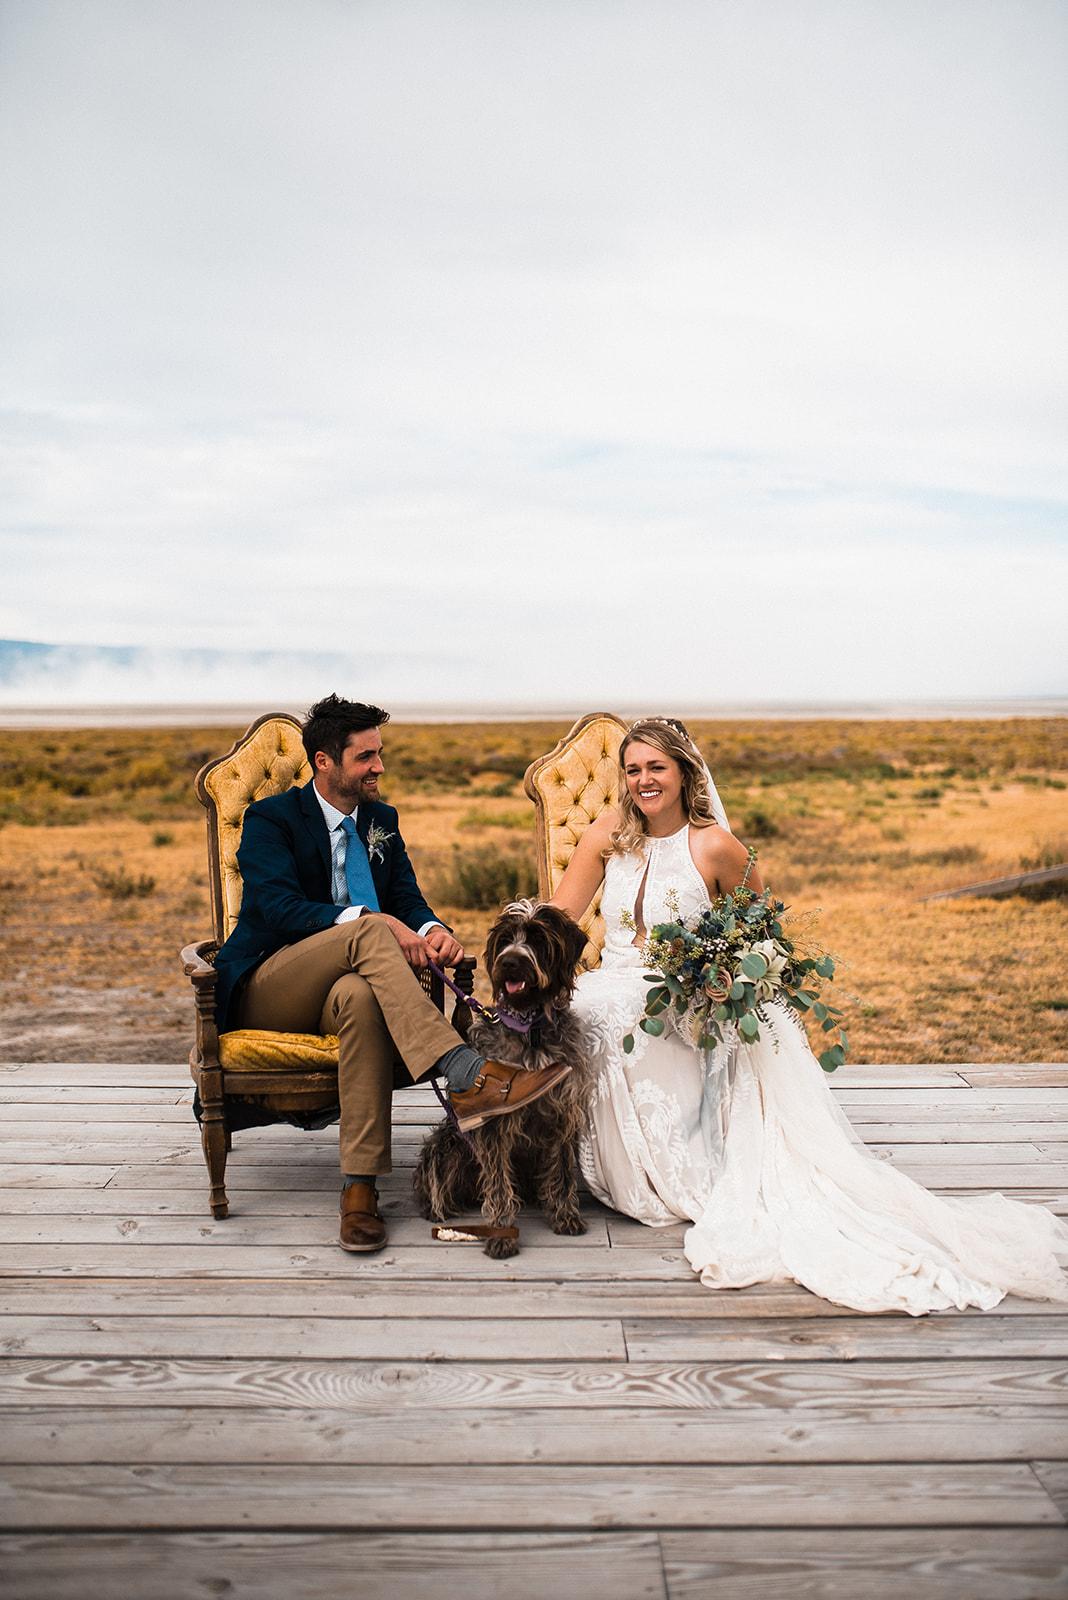 Madison_Guy_Wedding_The_Foxes_Photography_140.jpg